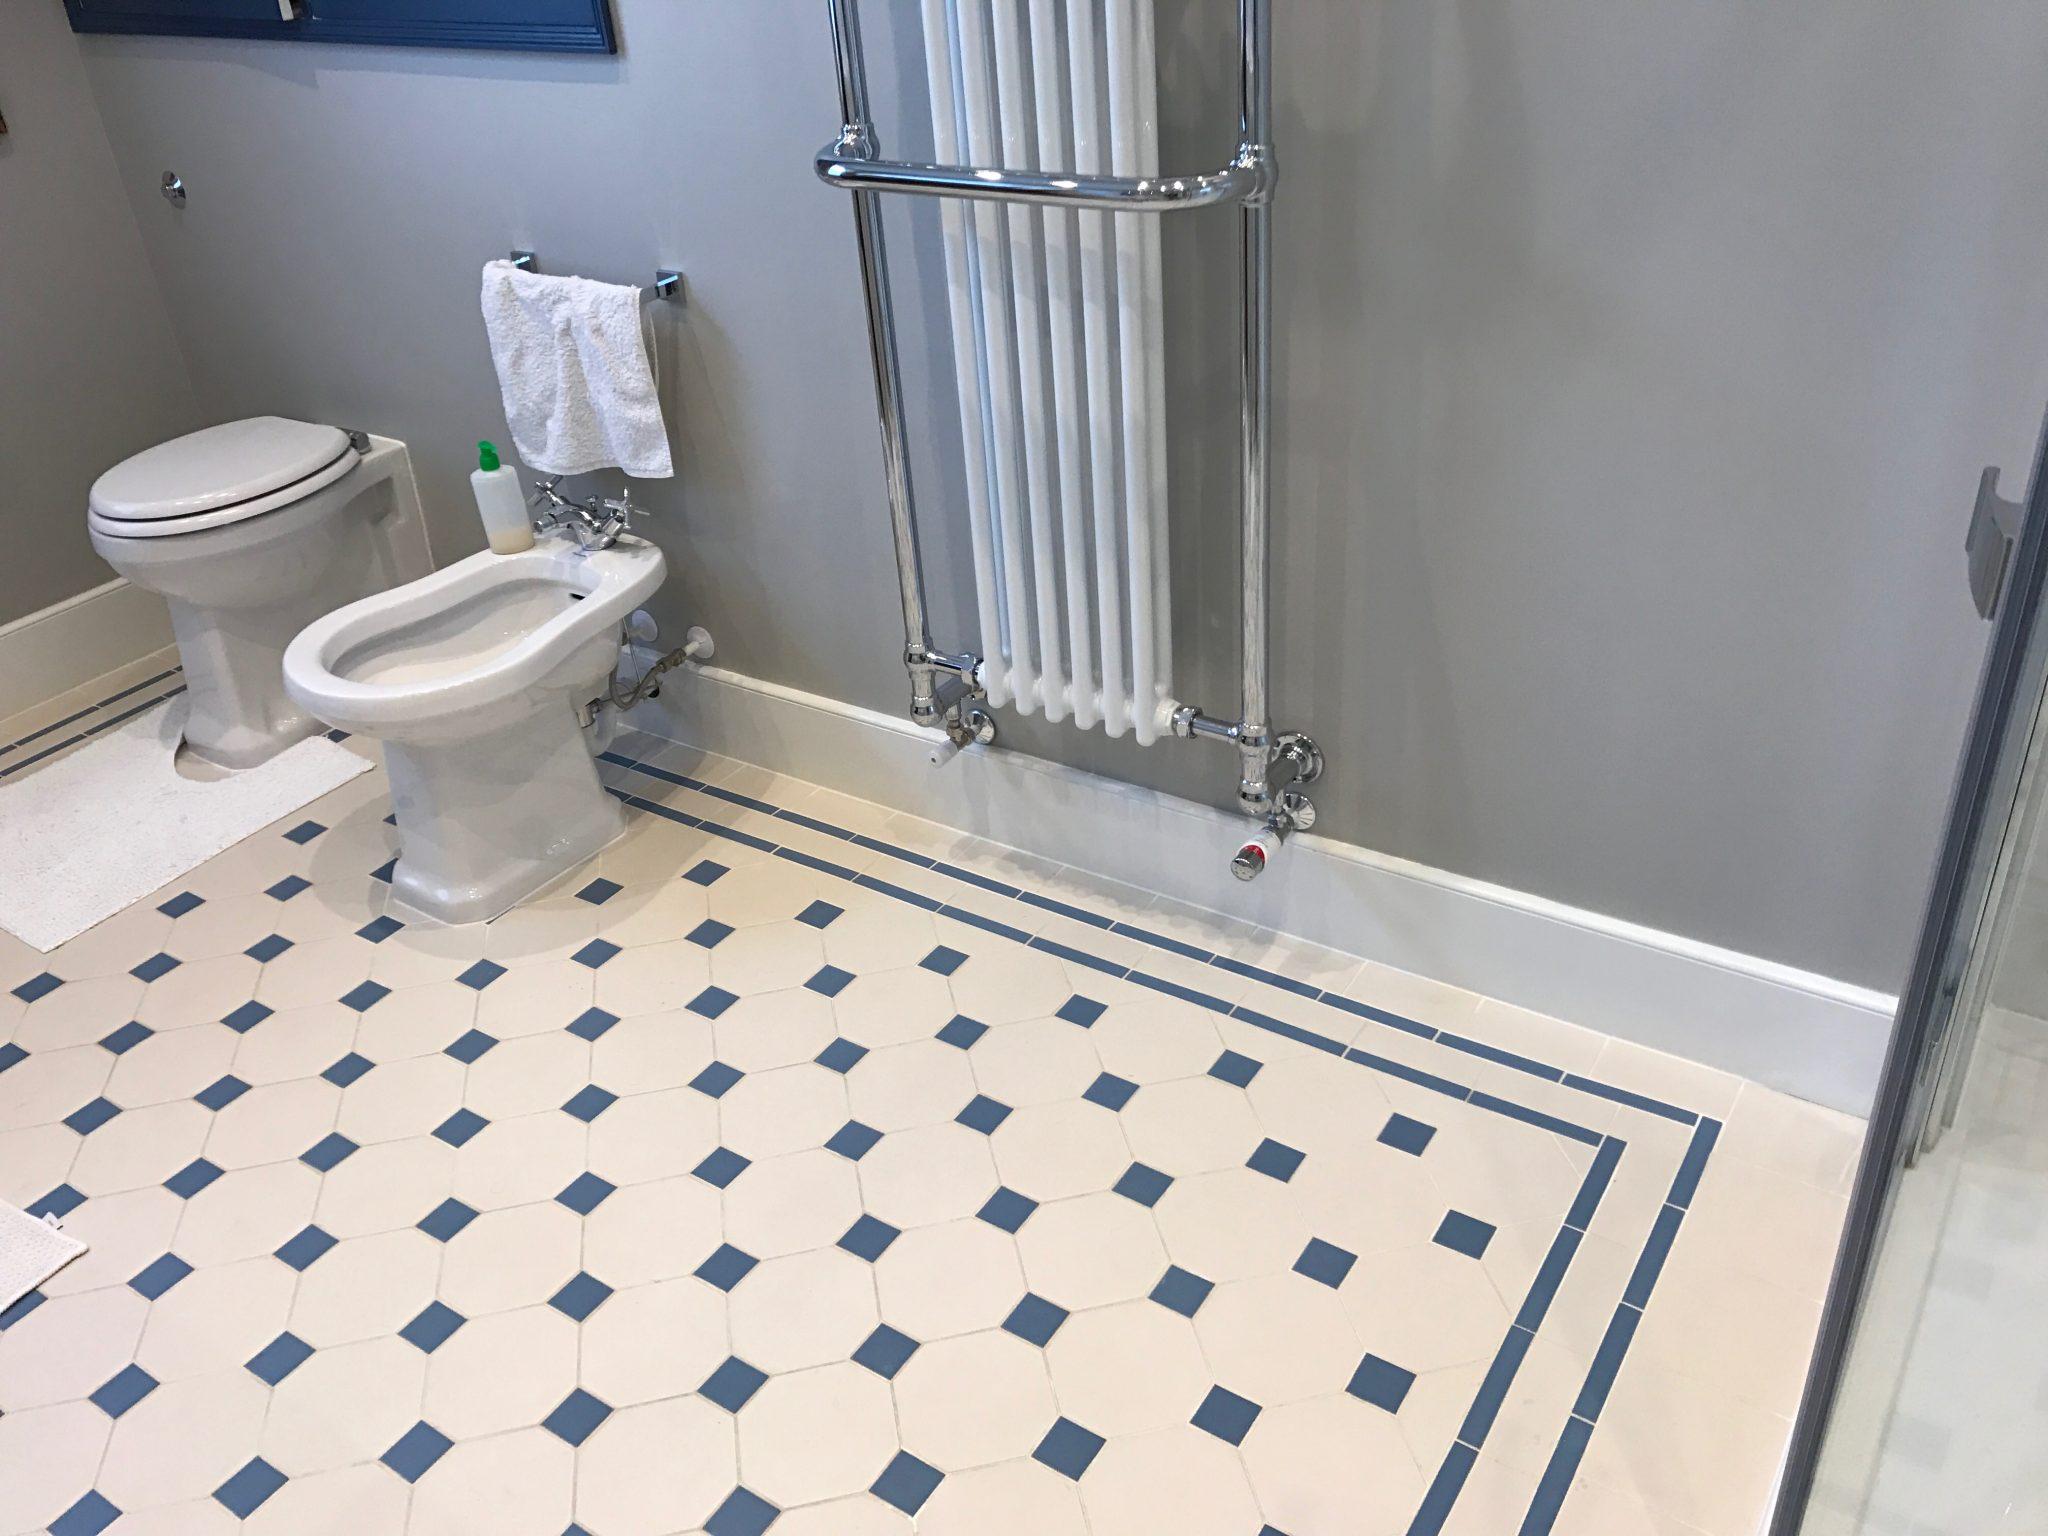 IMG 1164 - Tiling